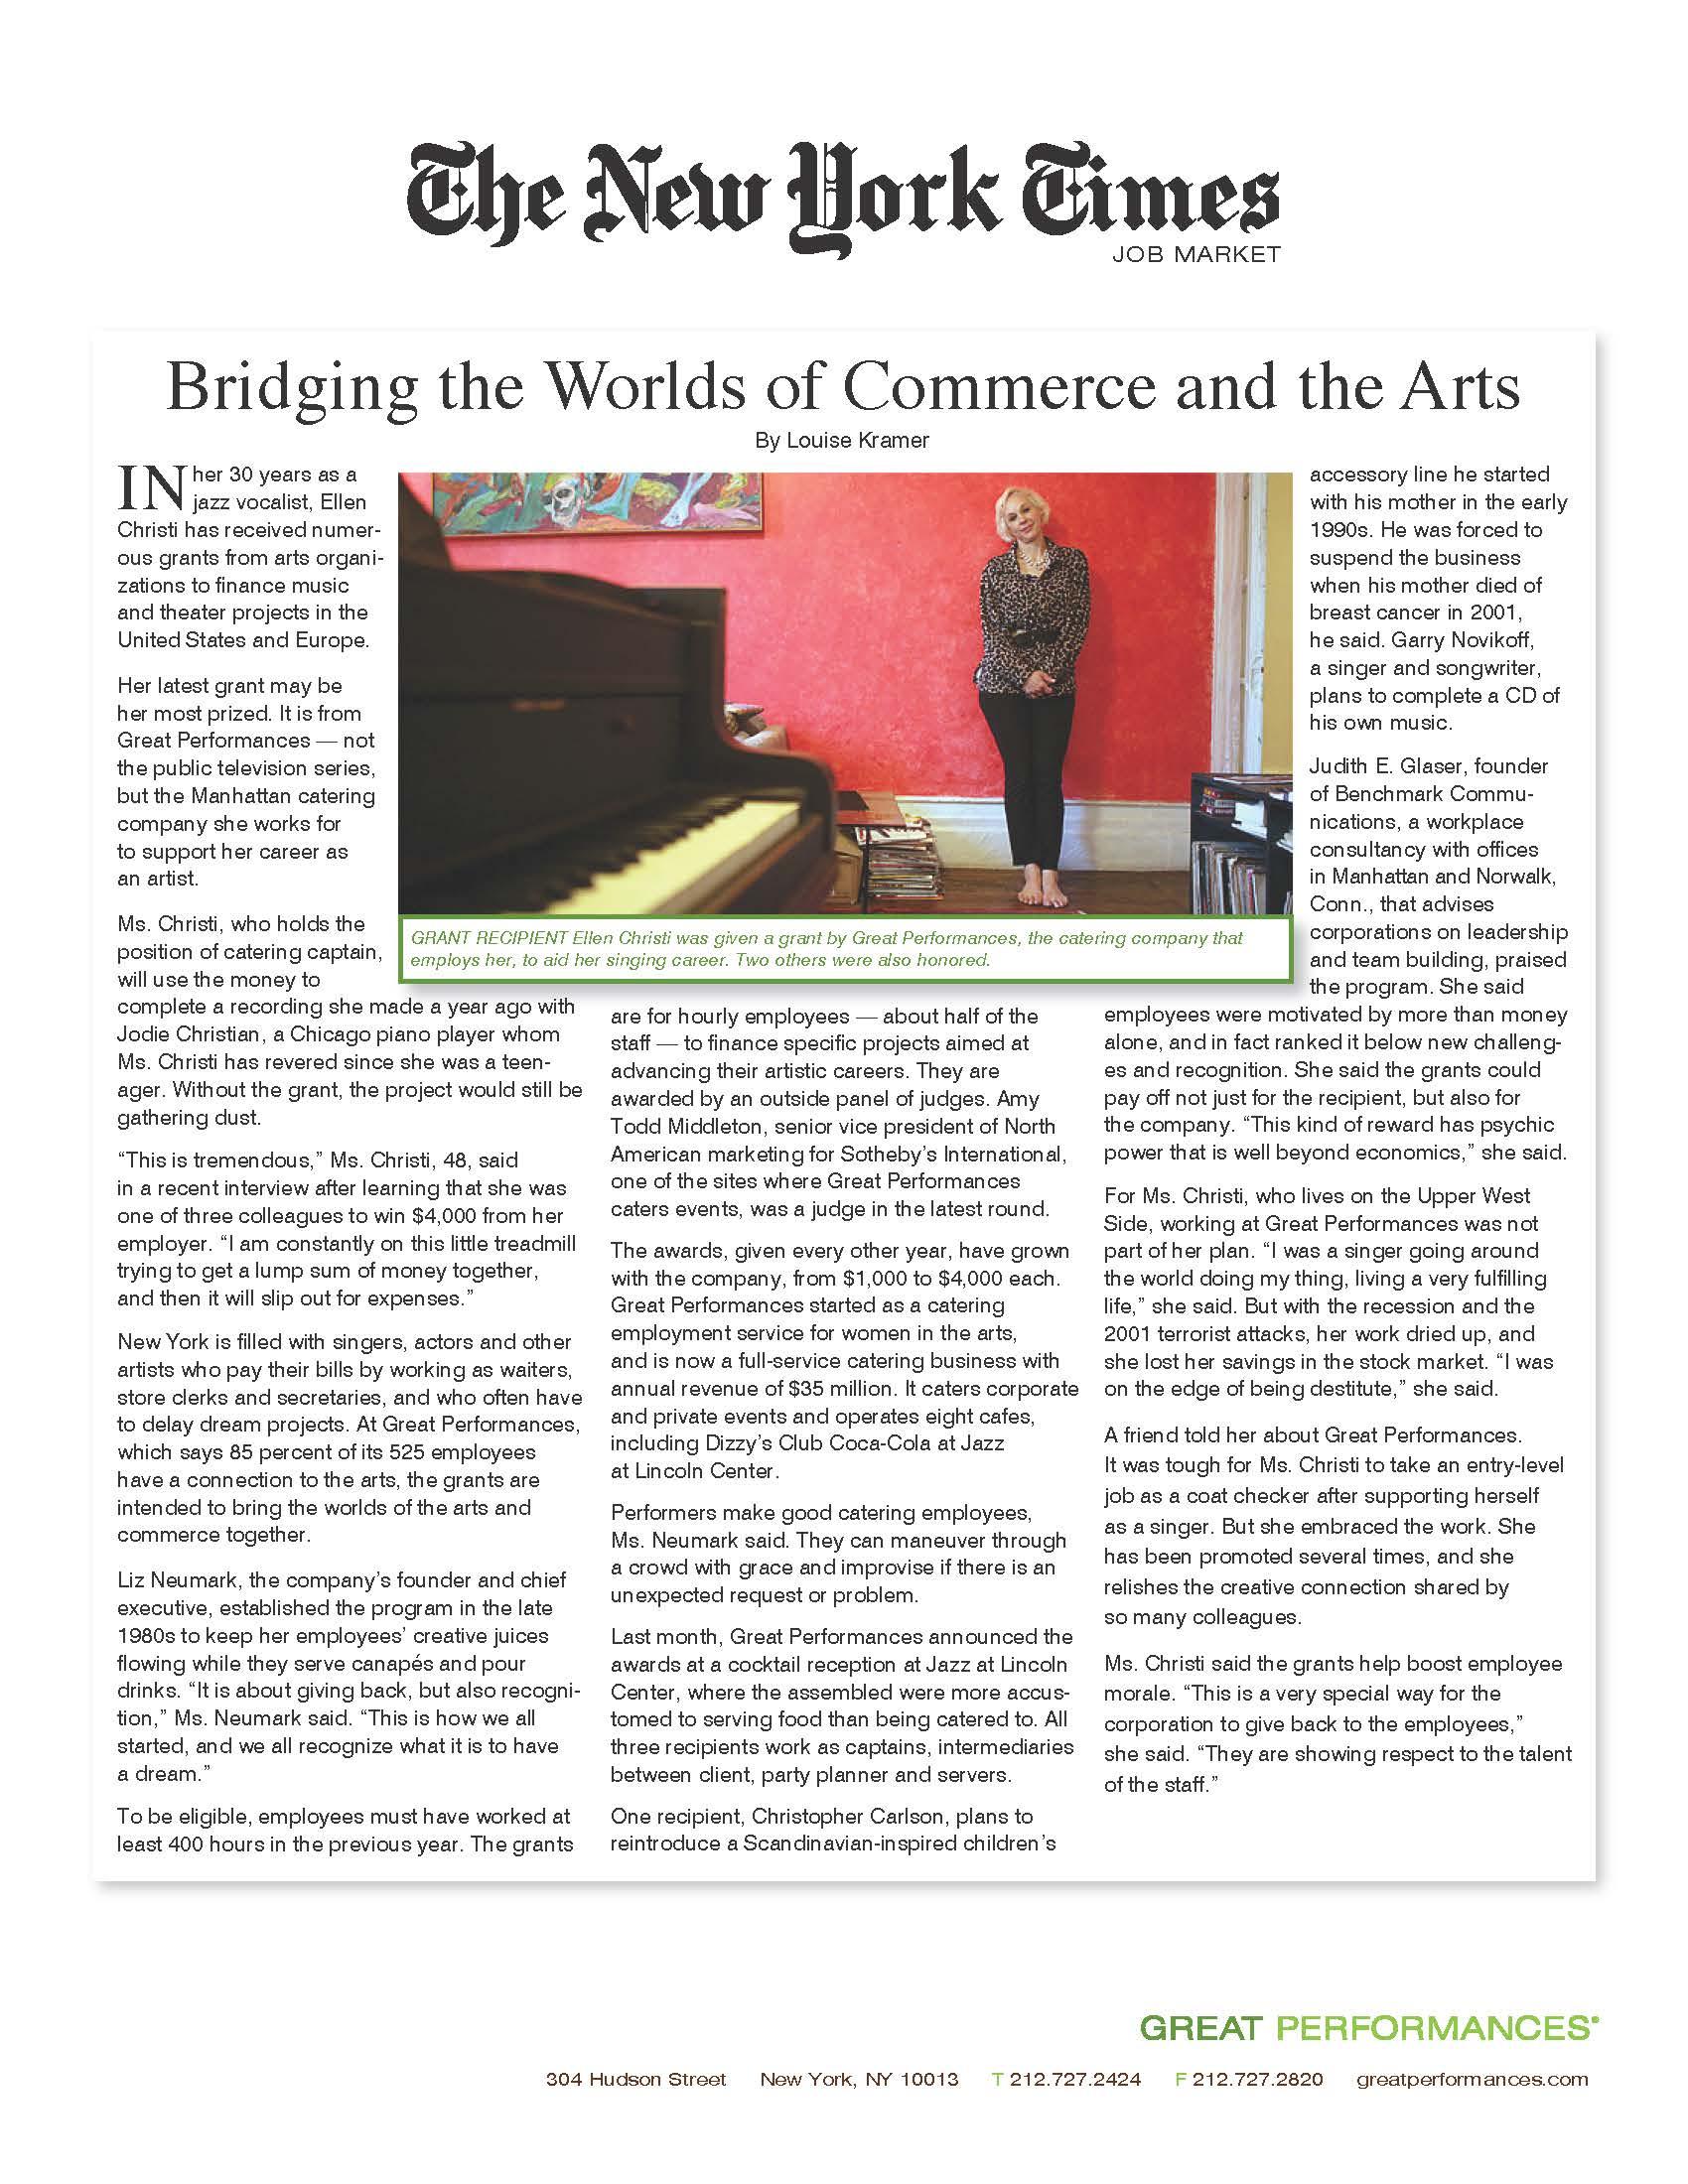 NYT_Bridging Worlds_Fellowship to Staff.jpg